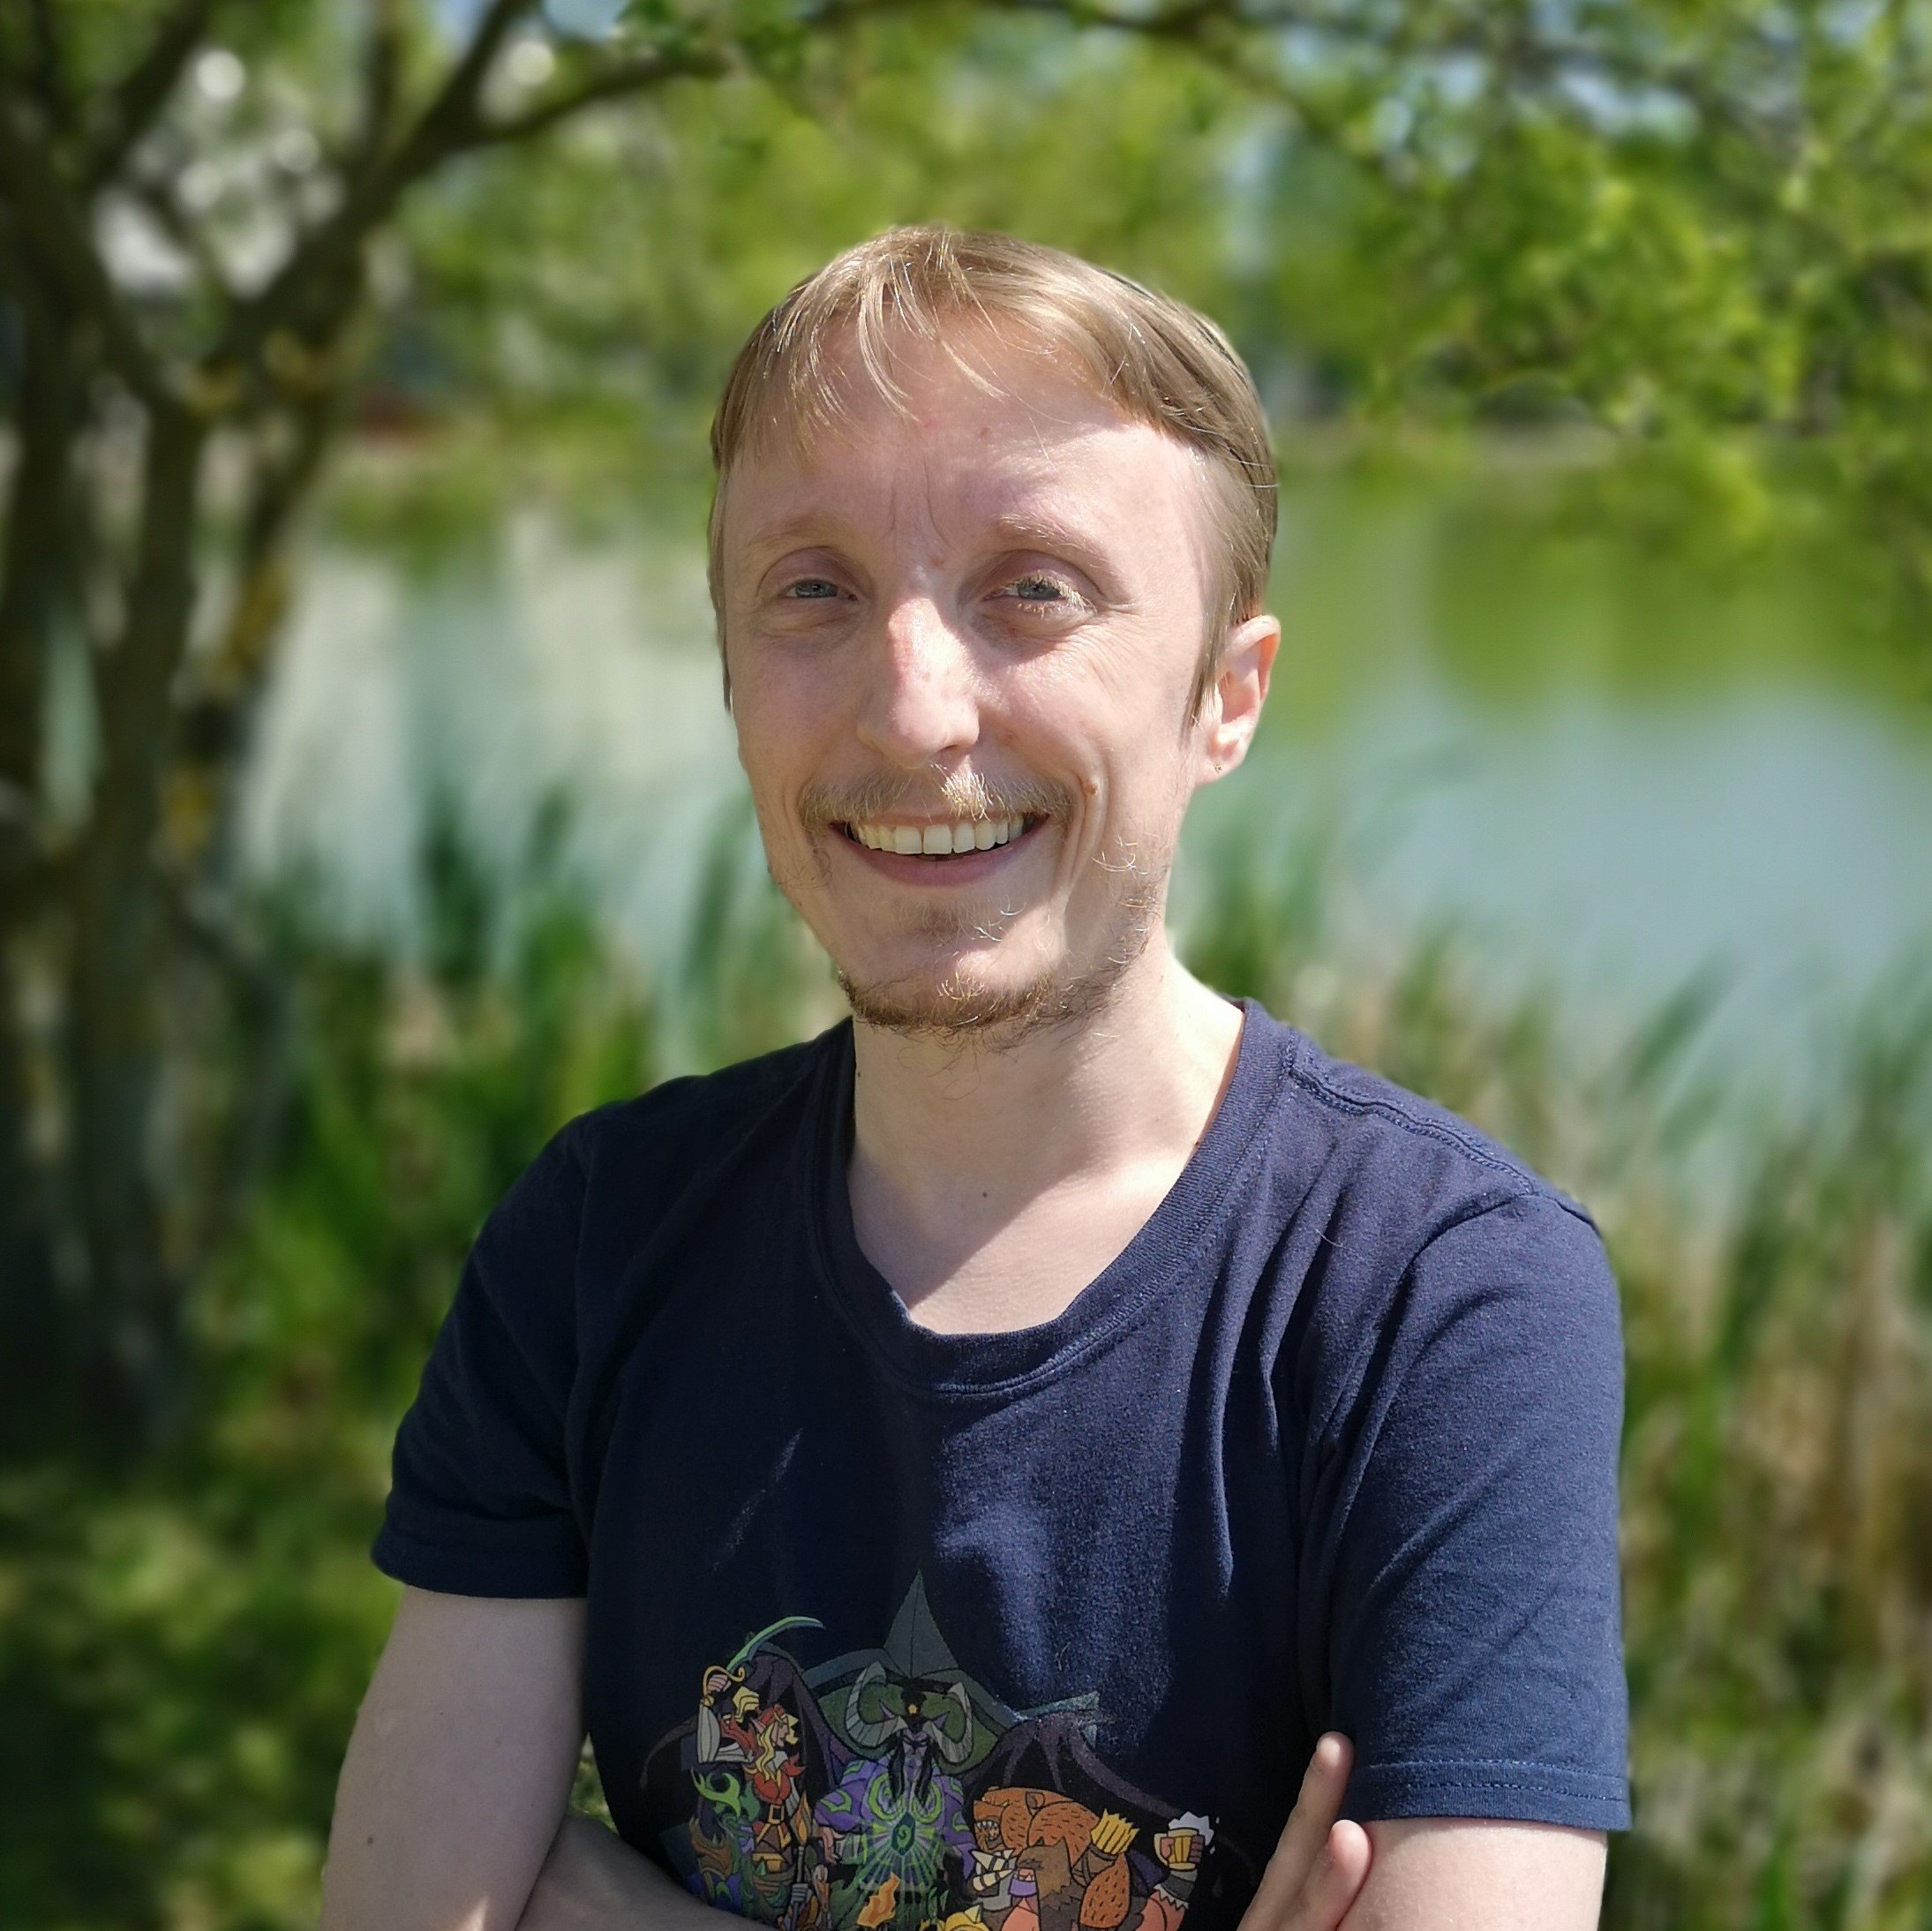 Sylvain Vaucher, Manager Webmarketing à Graciet & Co